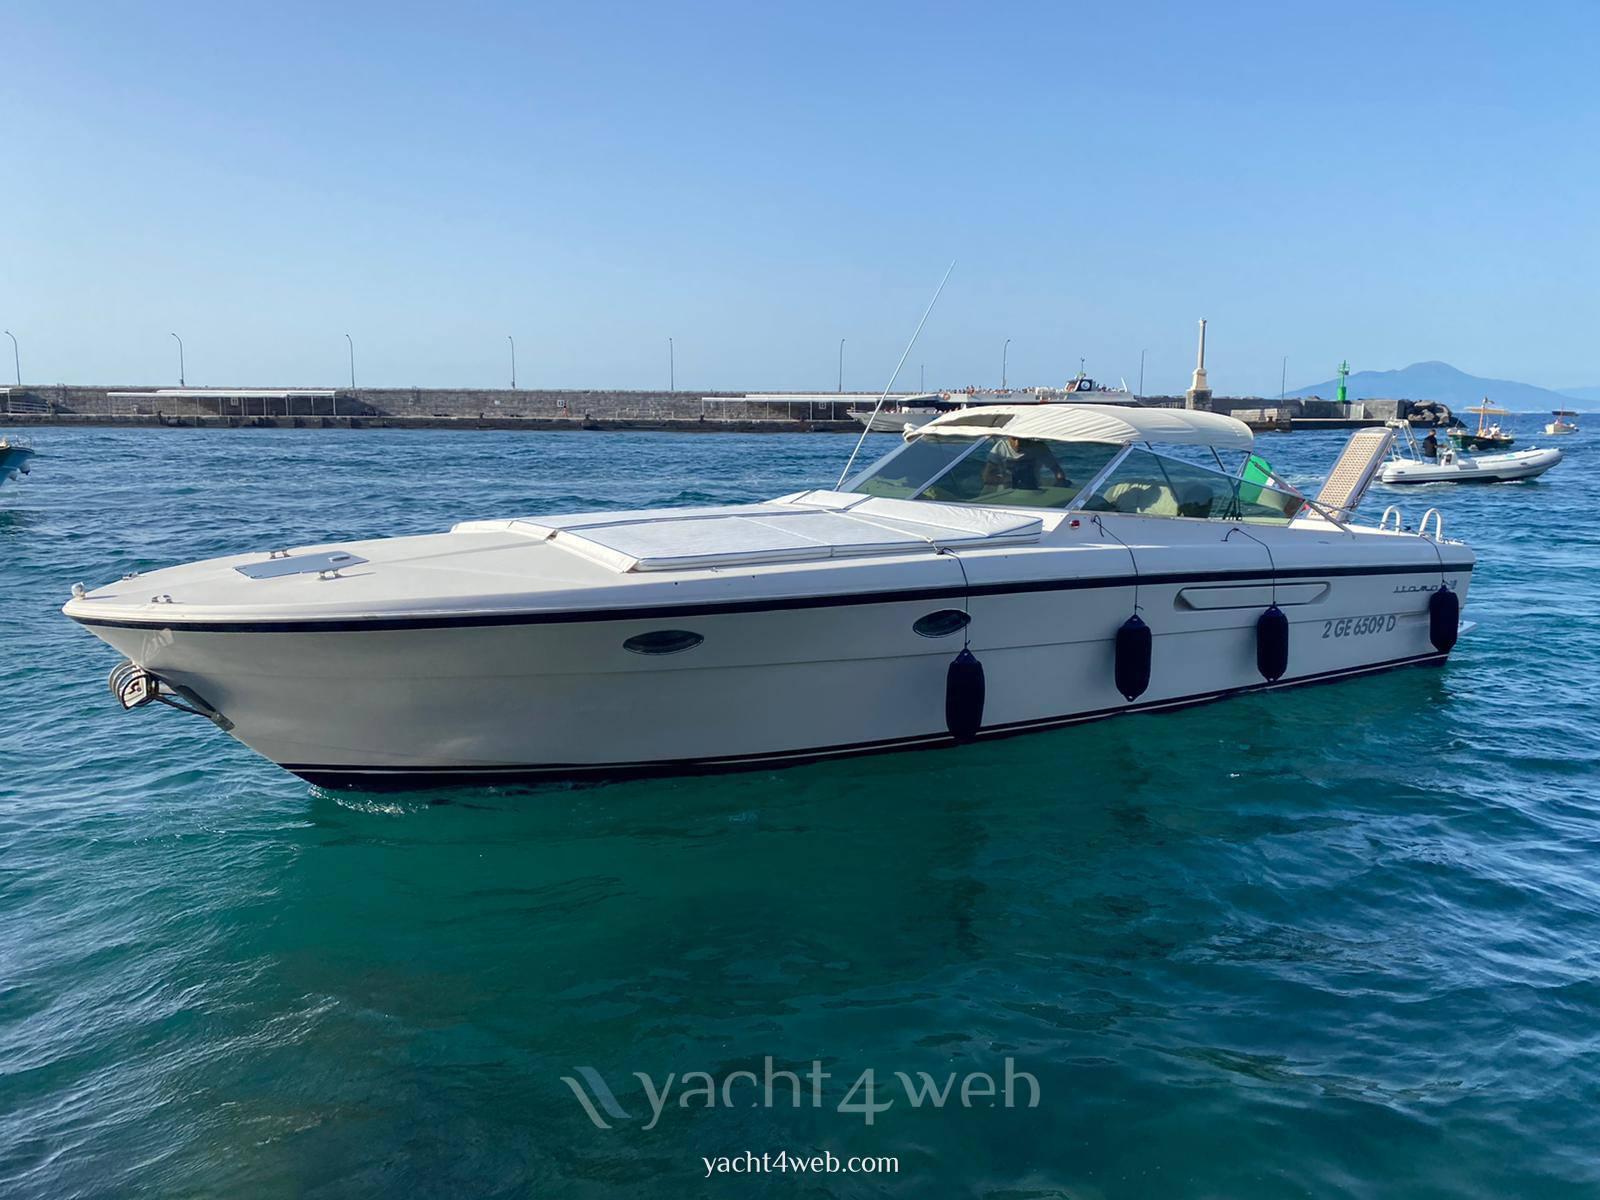 itama 38 Barca a motore usata in vendita